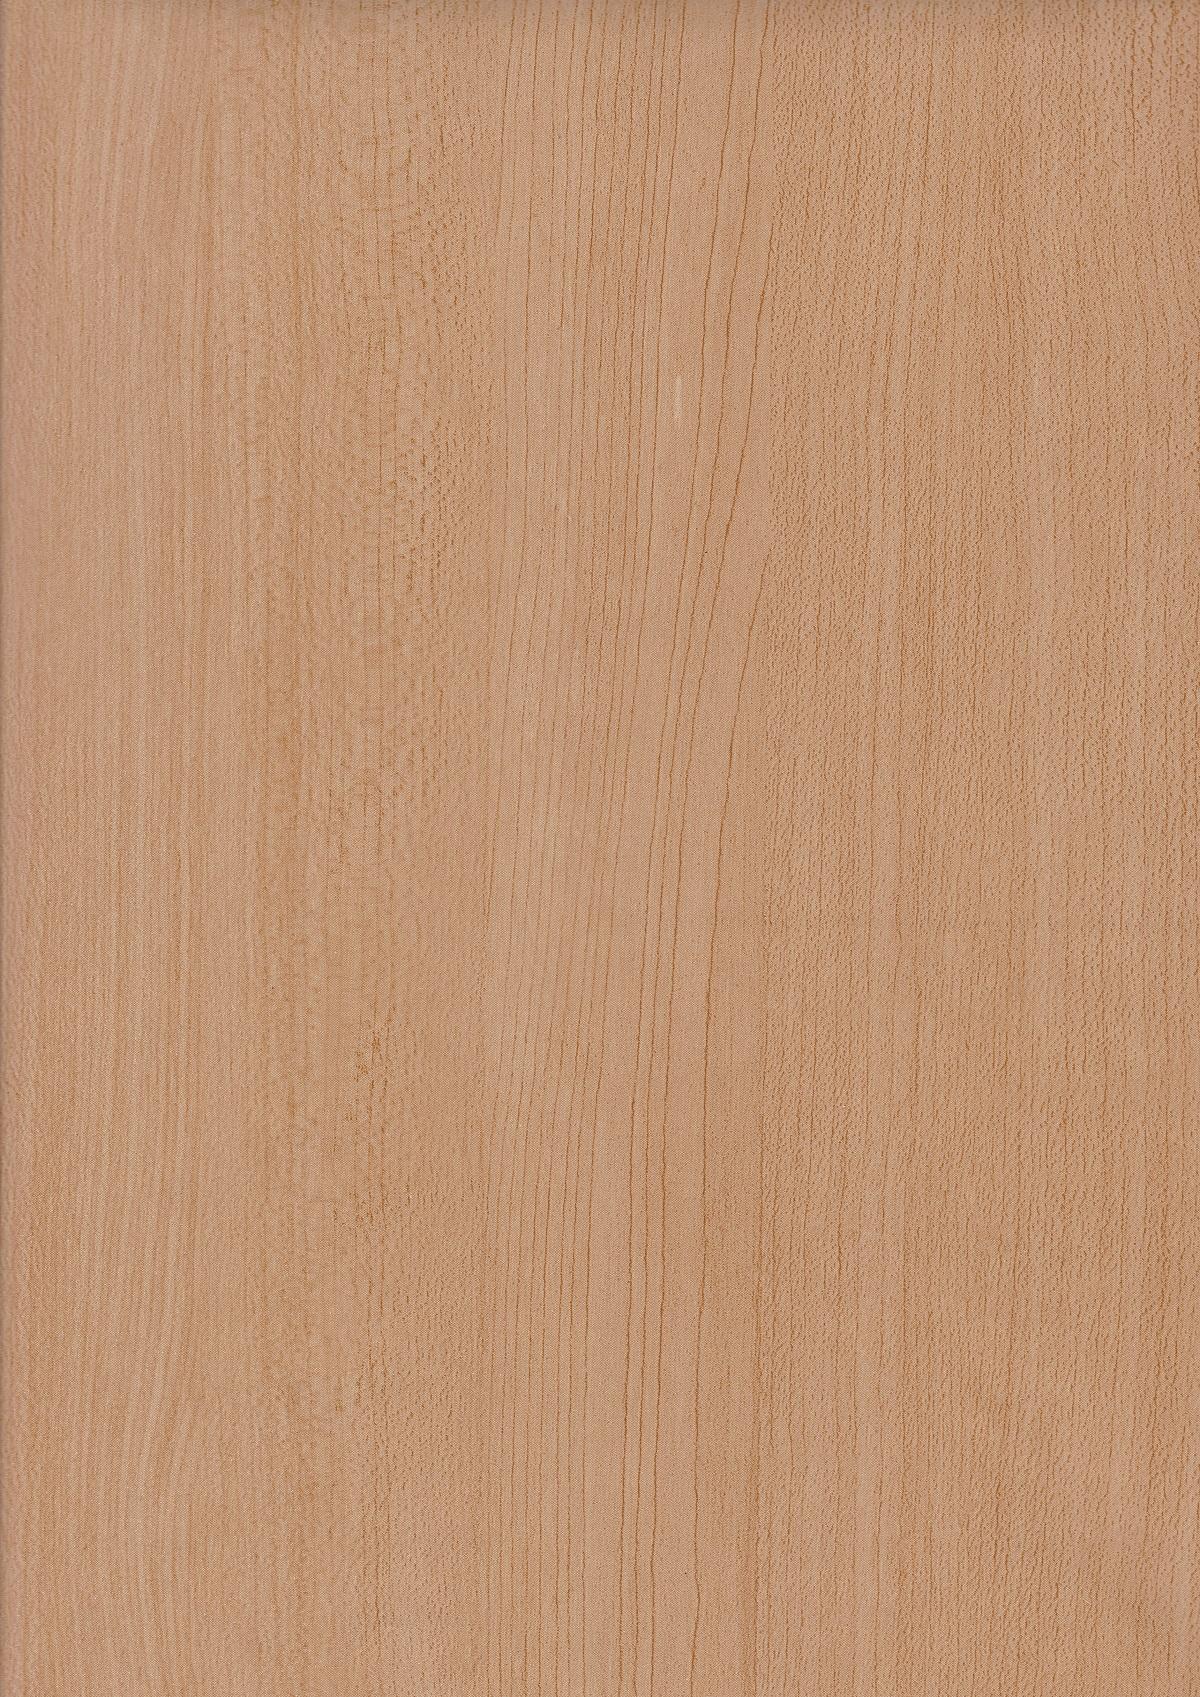 Indexbild 25 - Tapete / Folie selbstklebend 10 Meter Rolle Möbelfolie Klebefolie Wandfolie